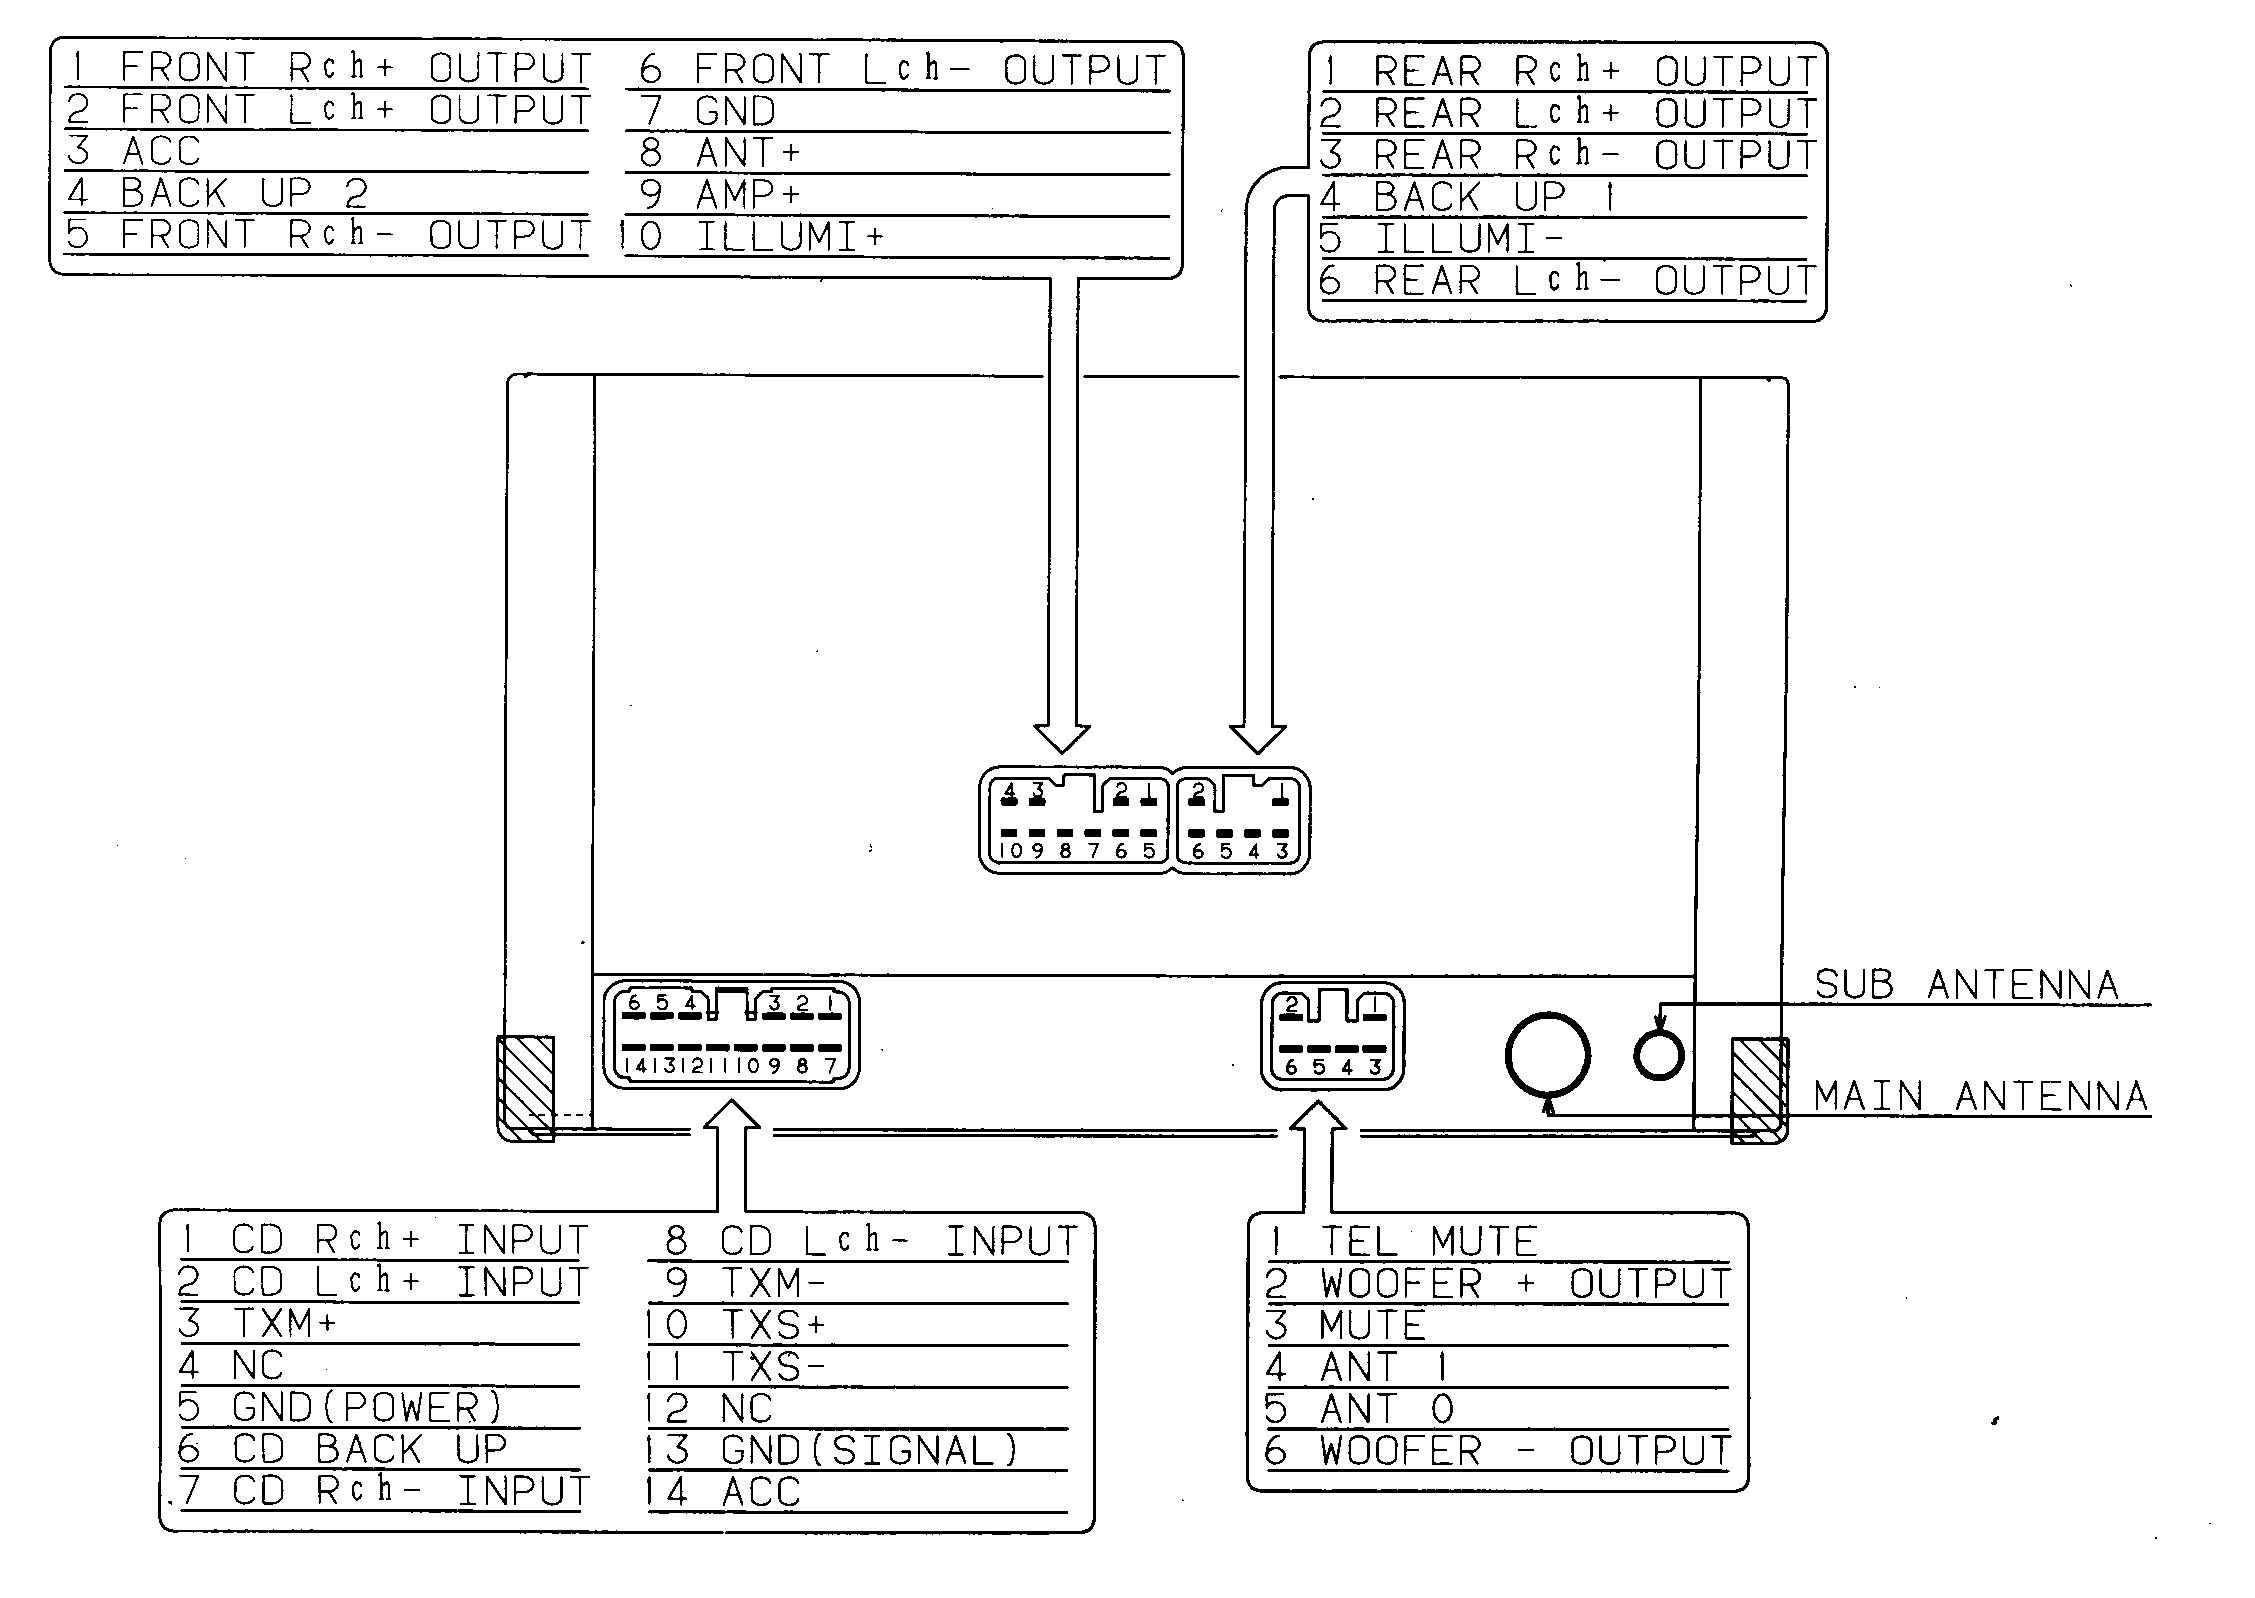 Filc20v2 Fierce Car Audio Wiring Diagram Wiring Diagram Schema Advice Energy A Advice Energy A Atmosphereconcept It